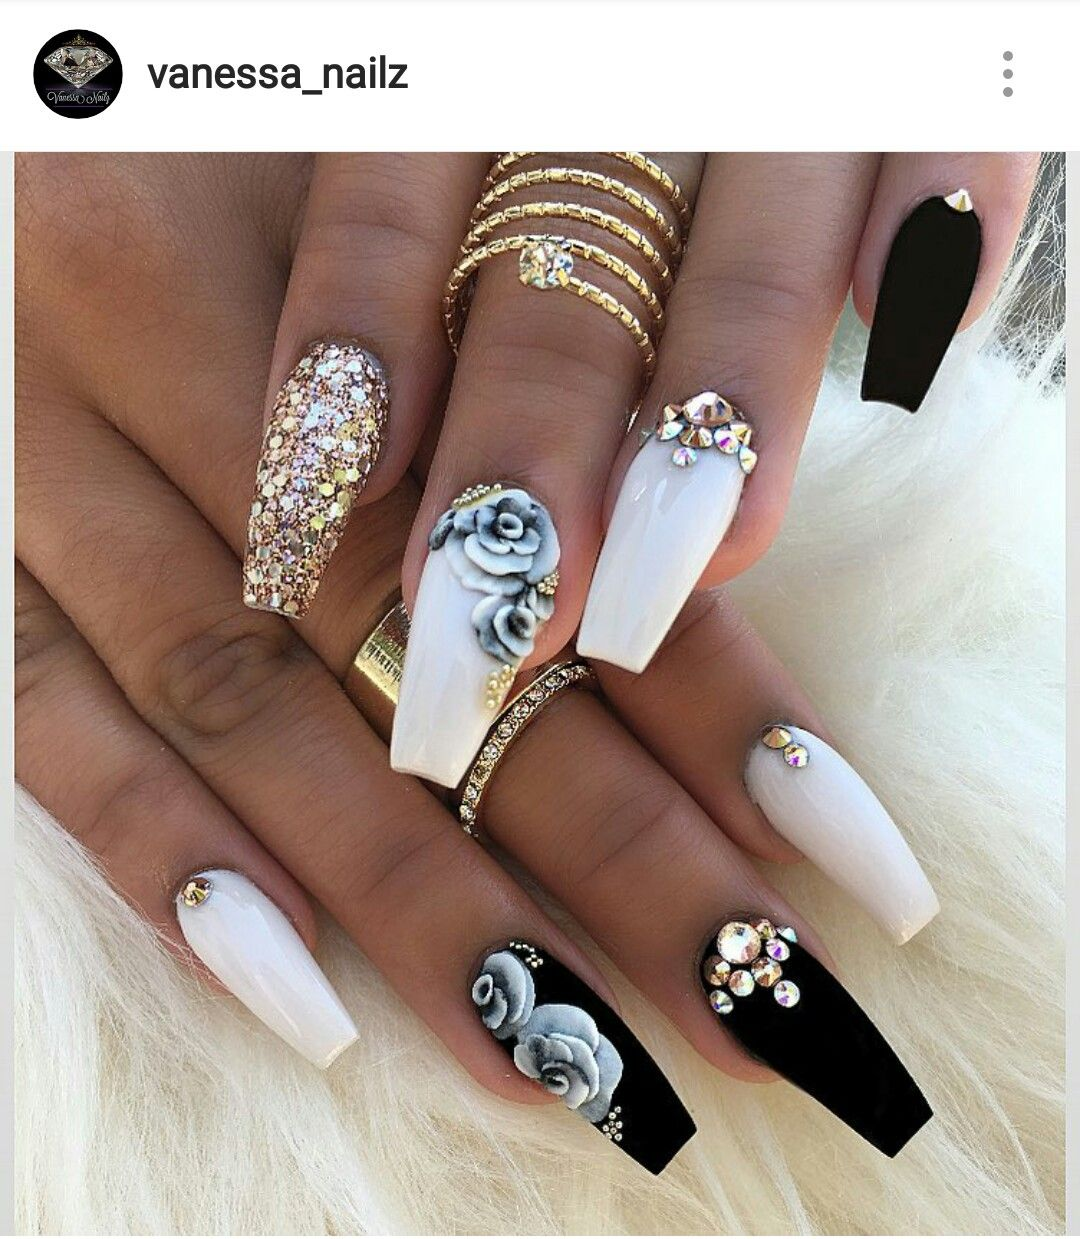 Black, White, \u0026 Gold Nails by @vanessa_nailz on IG♡